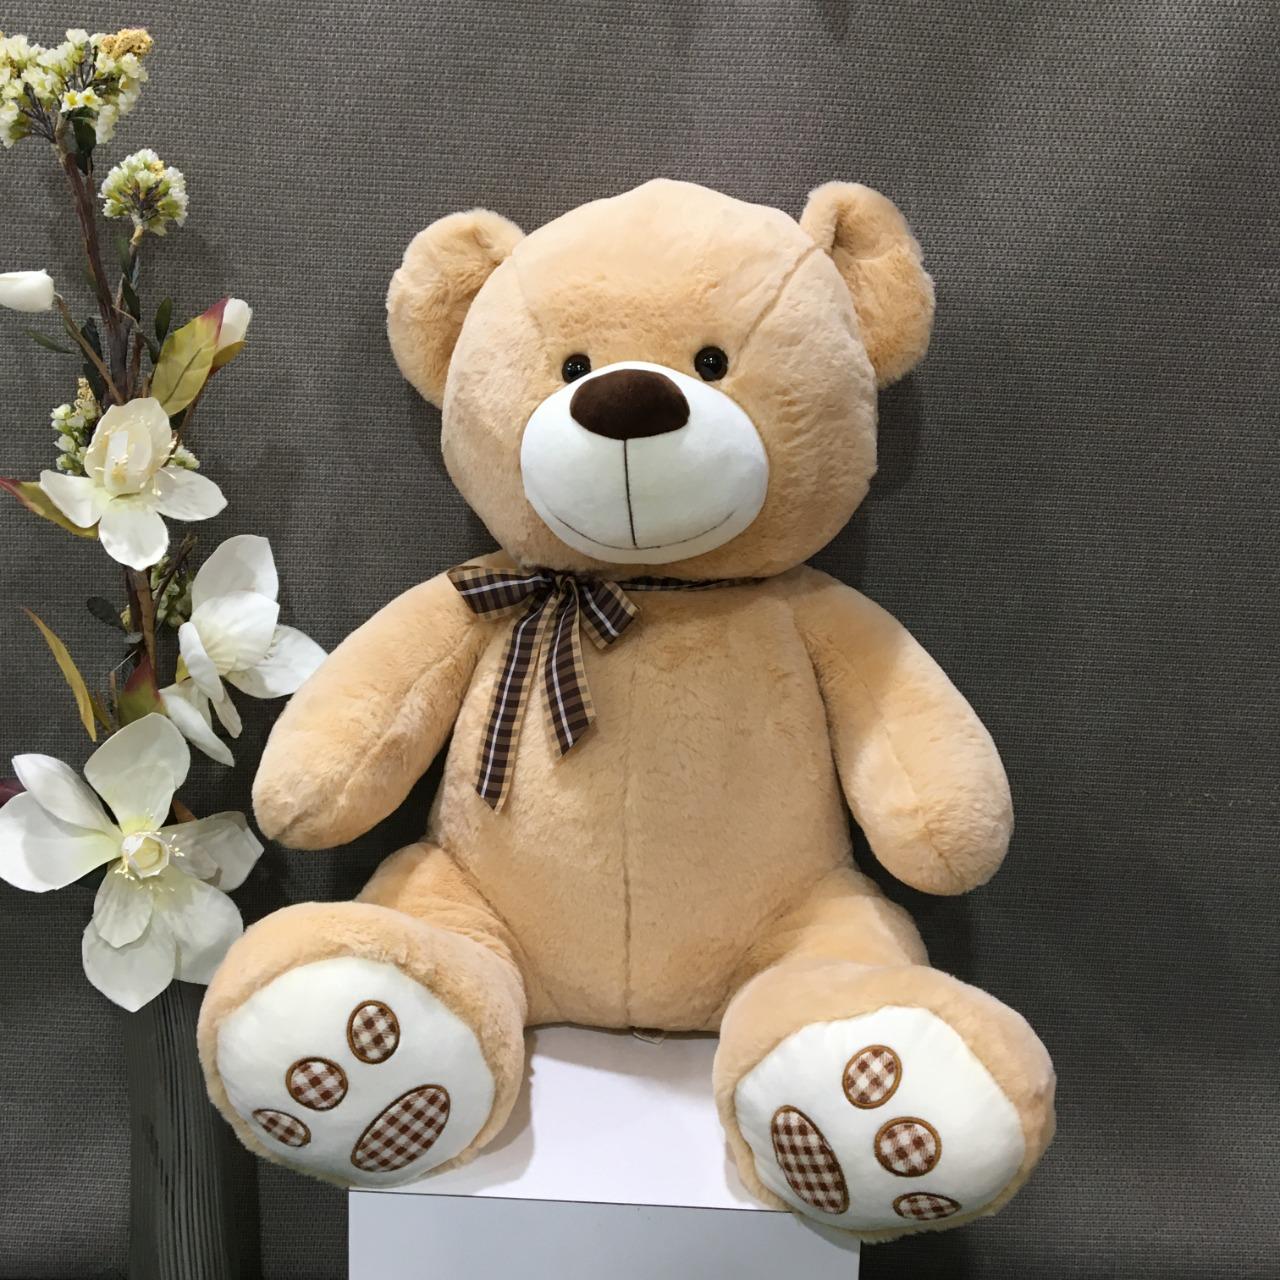 50% Off - Teddy Bear, Extra Large, Cream